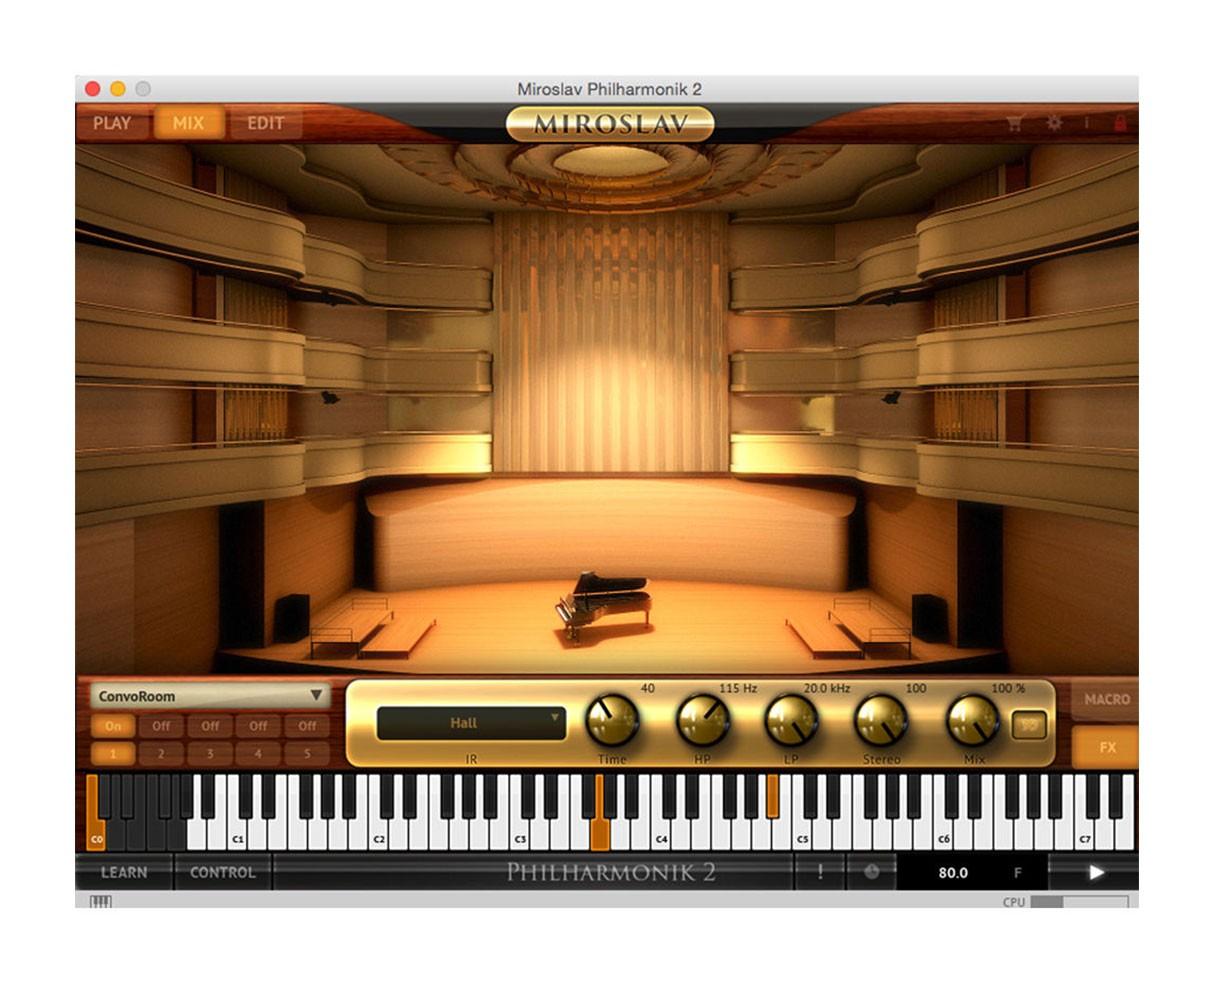 miroslav philharmonik 2 download